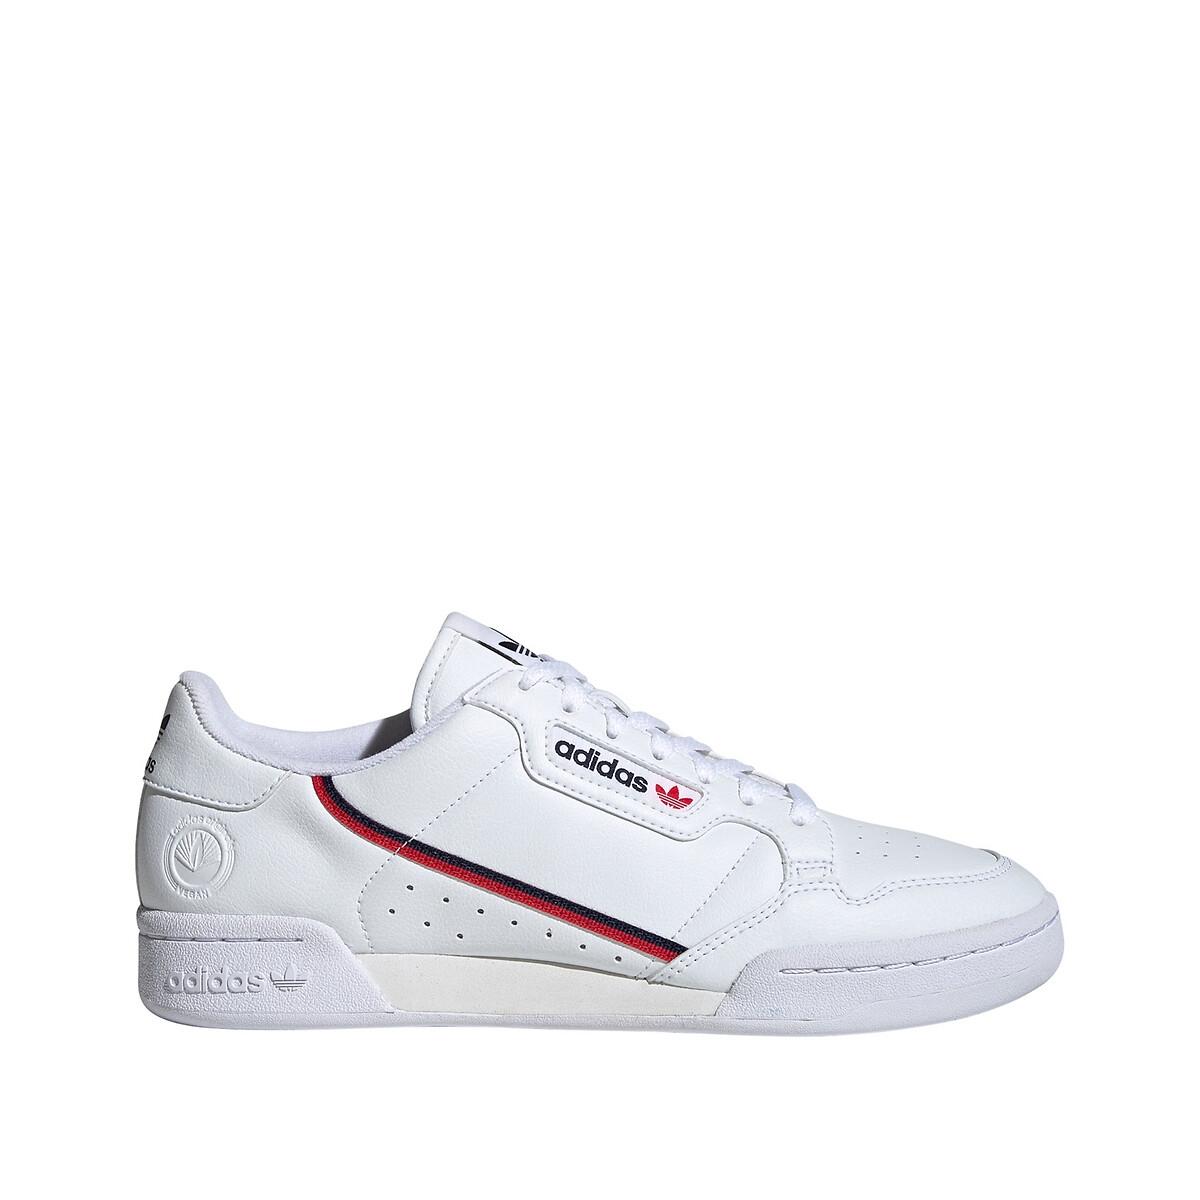 Adidas Originals Continental 80 Schoenen Cloud White / Scarlet / Collegiate Navy/Blue/Red Kind online kopen